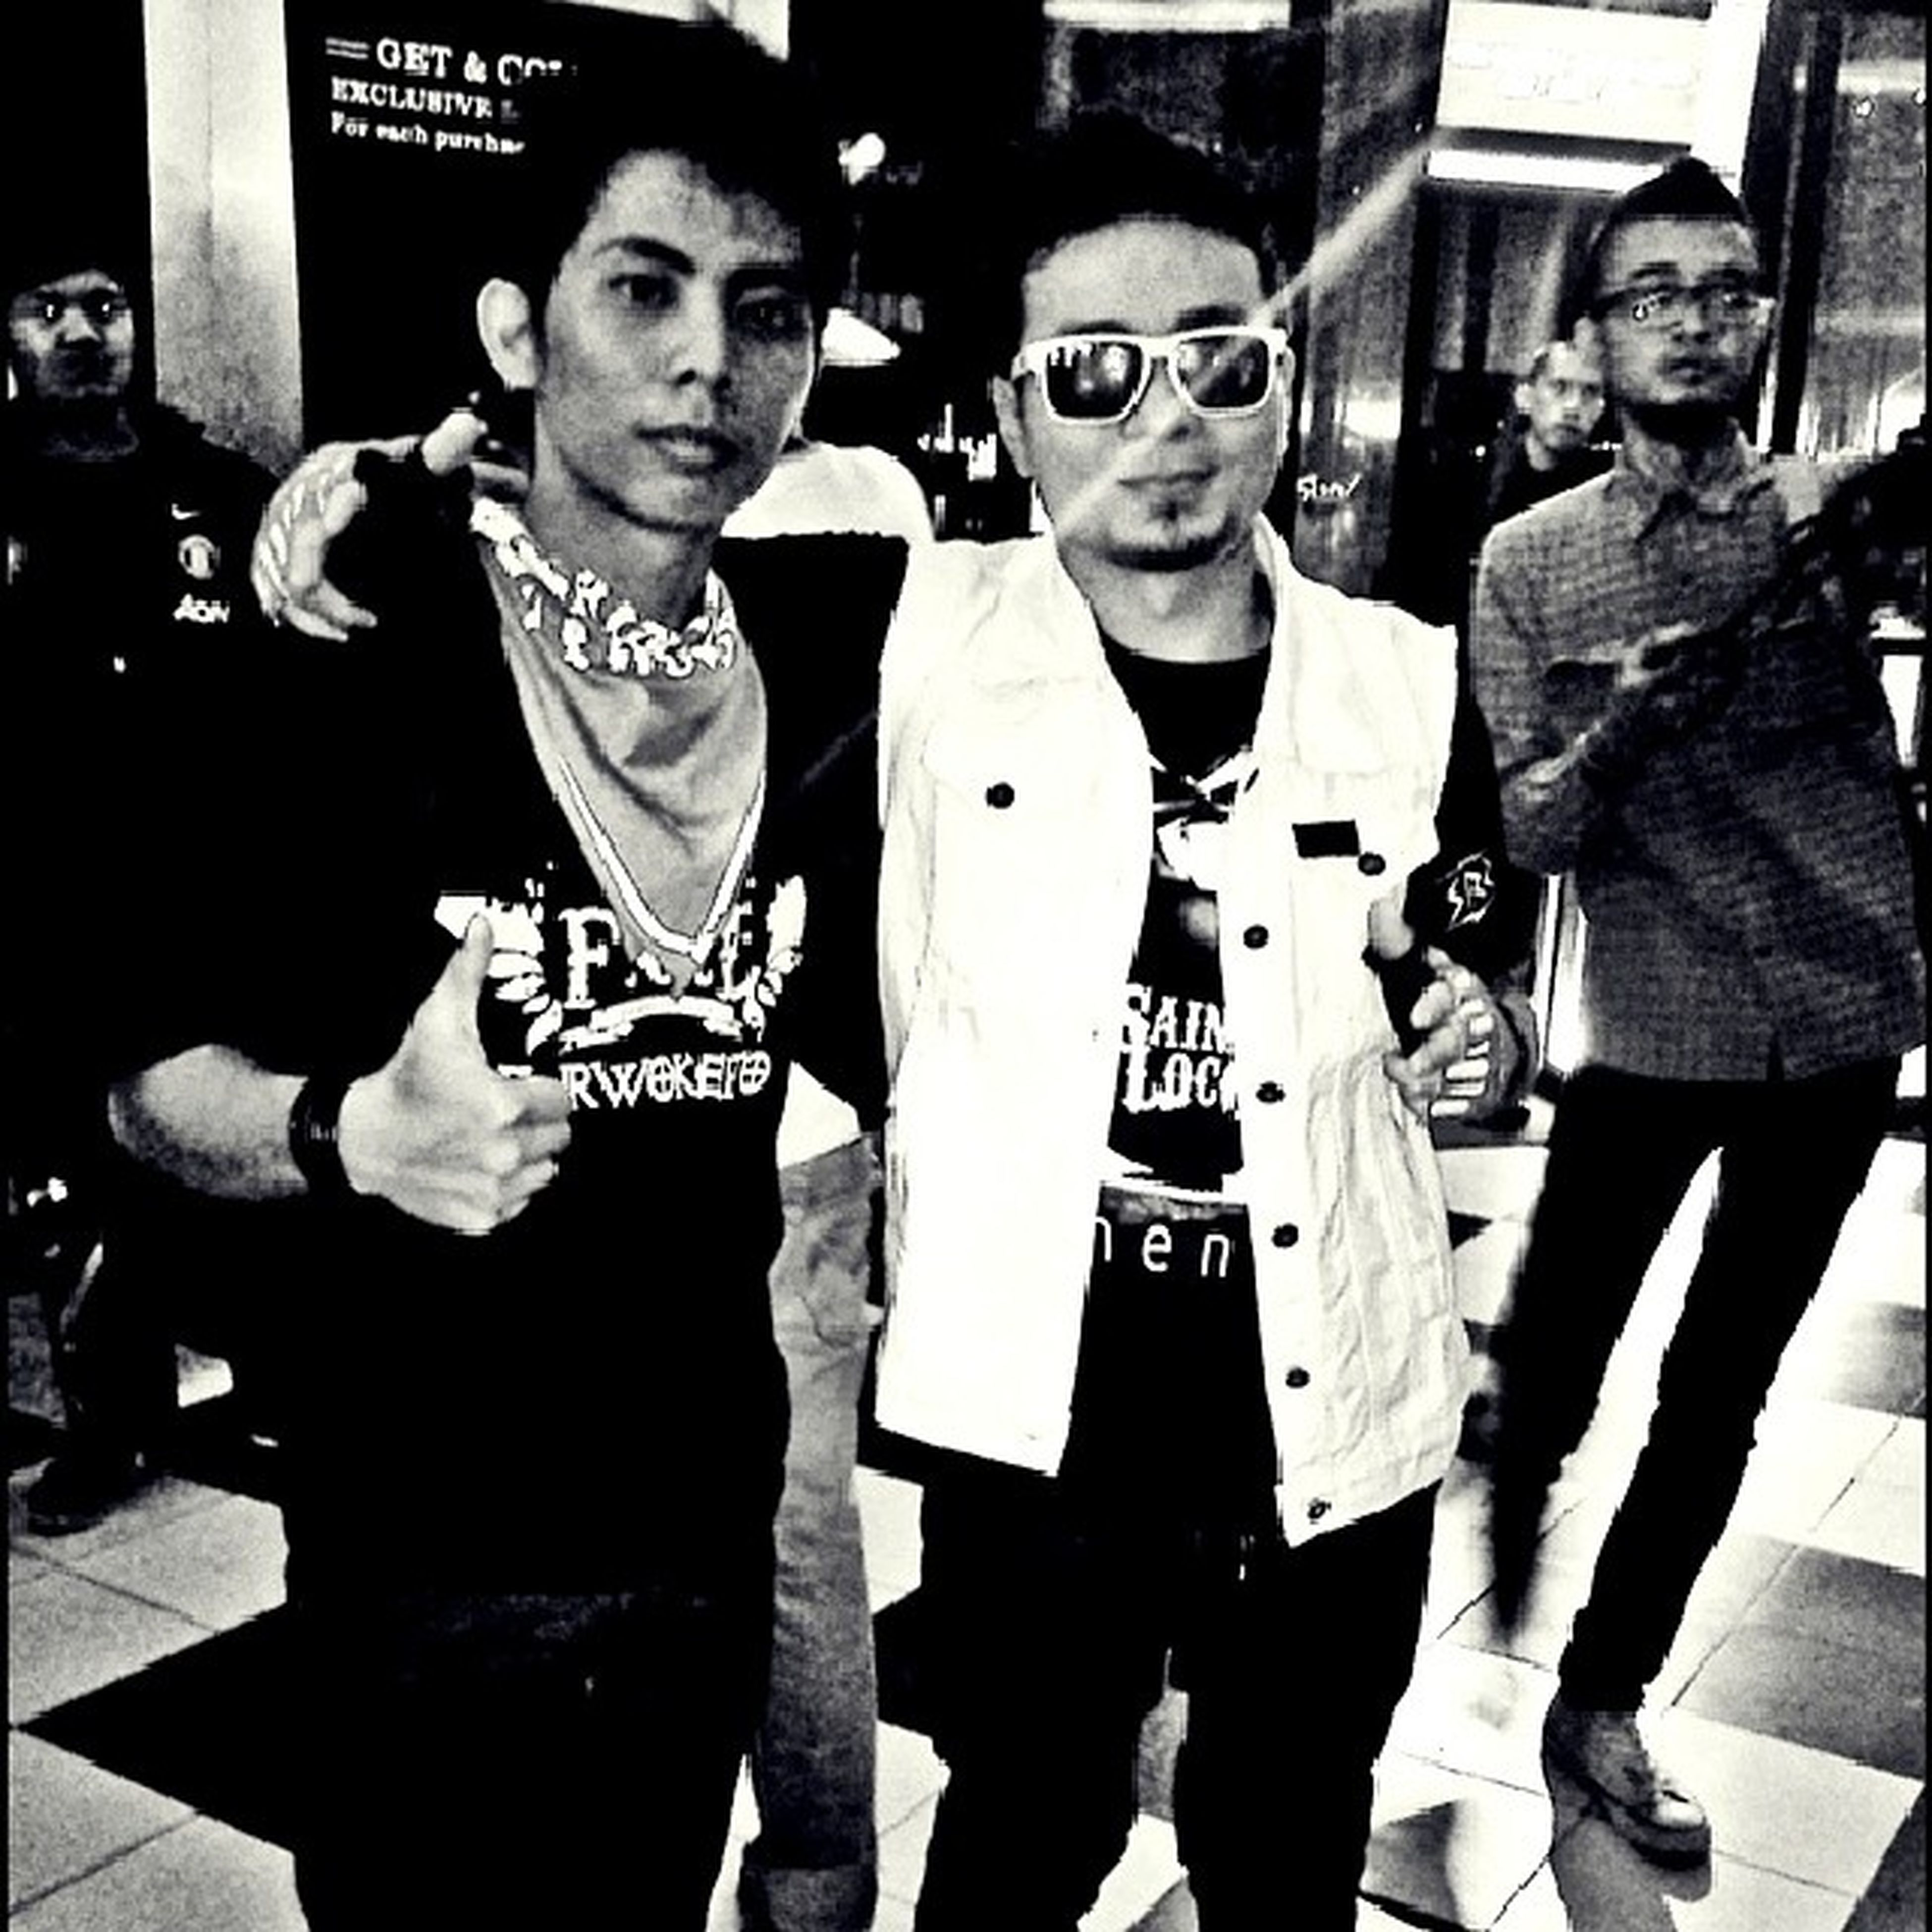 Gantengan siapa? :-D Superlatepost Me Saintjoe Momentconcert 3album music fol purwokerto. indonesia